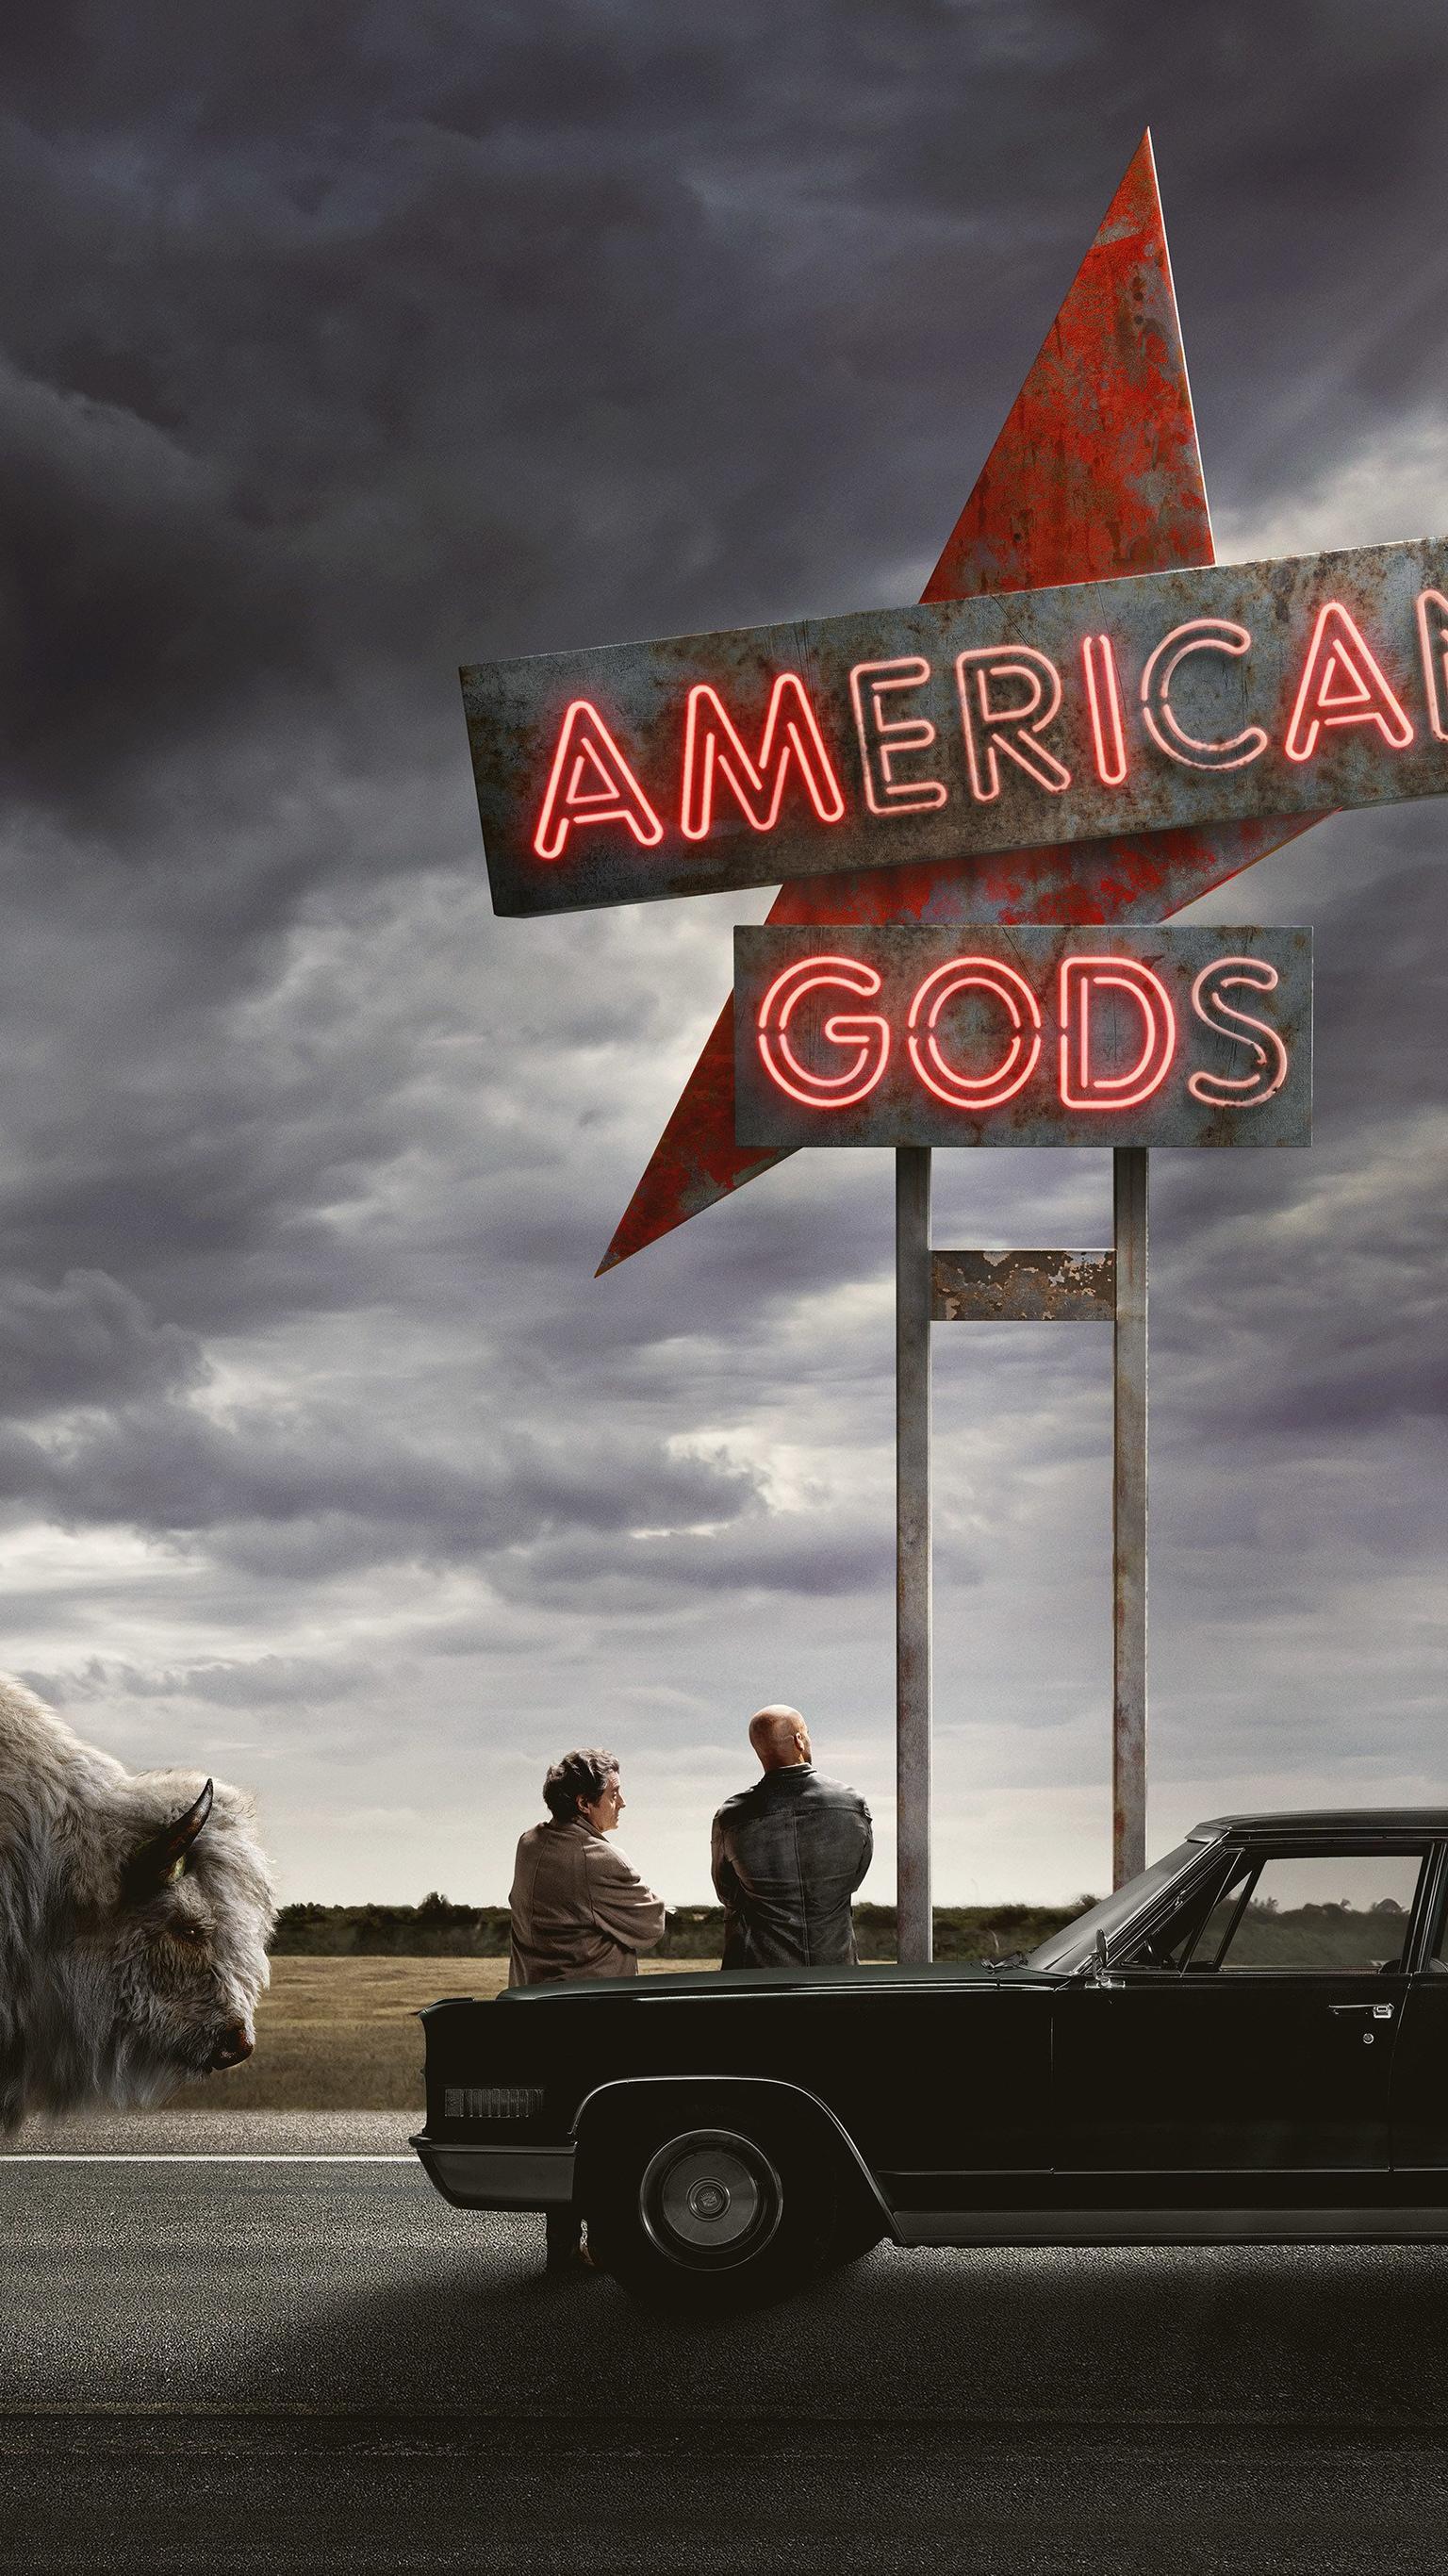 American Gods Phone Wallpaper - American Gods Season 2 Itunes , HD Wallpaper & Backgrounds